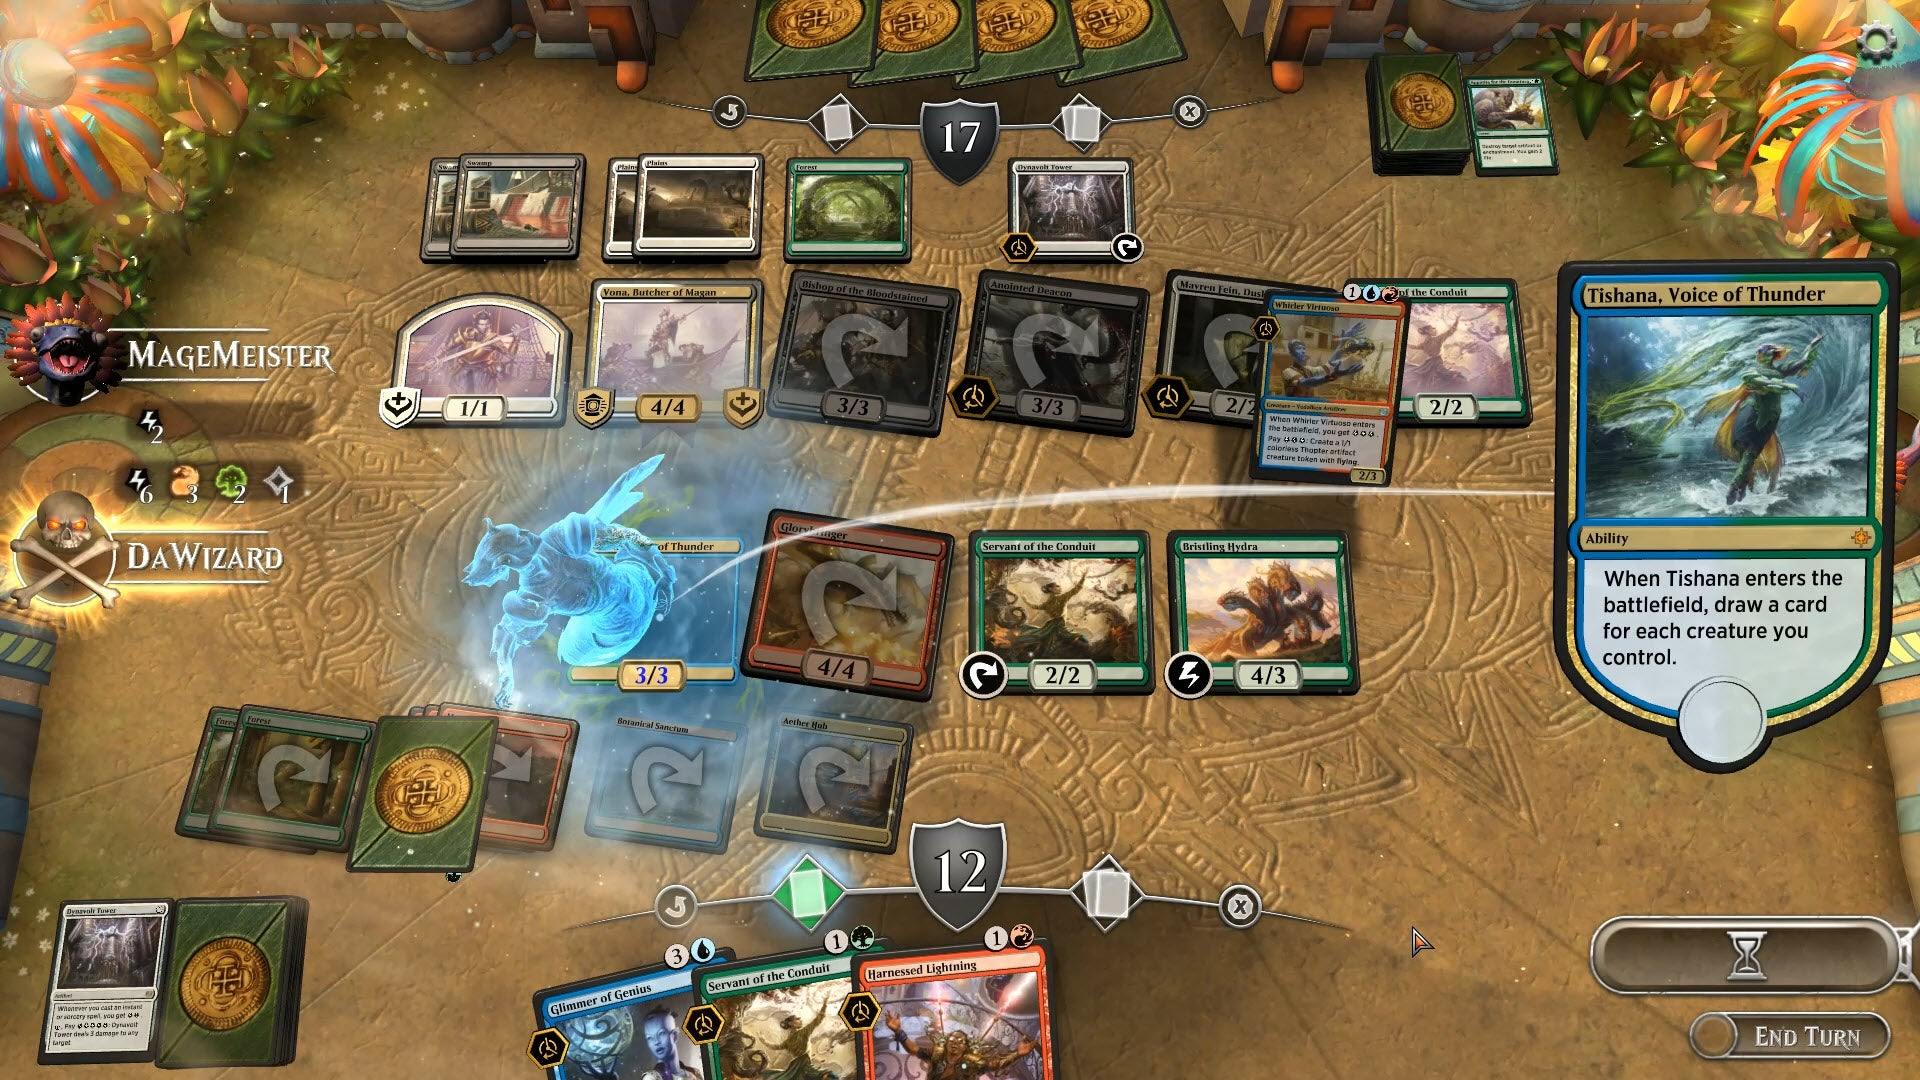 magic the gathering arena beta access code